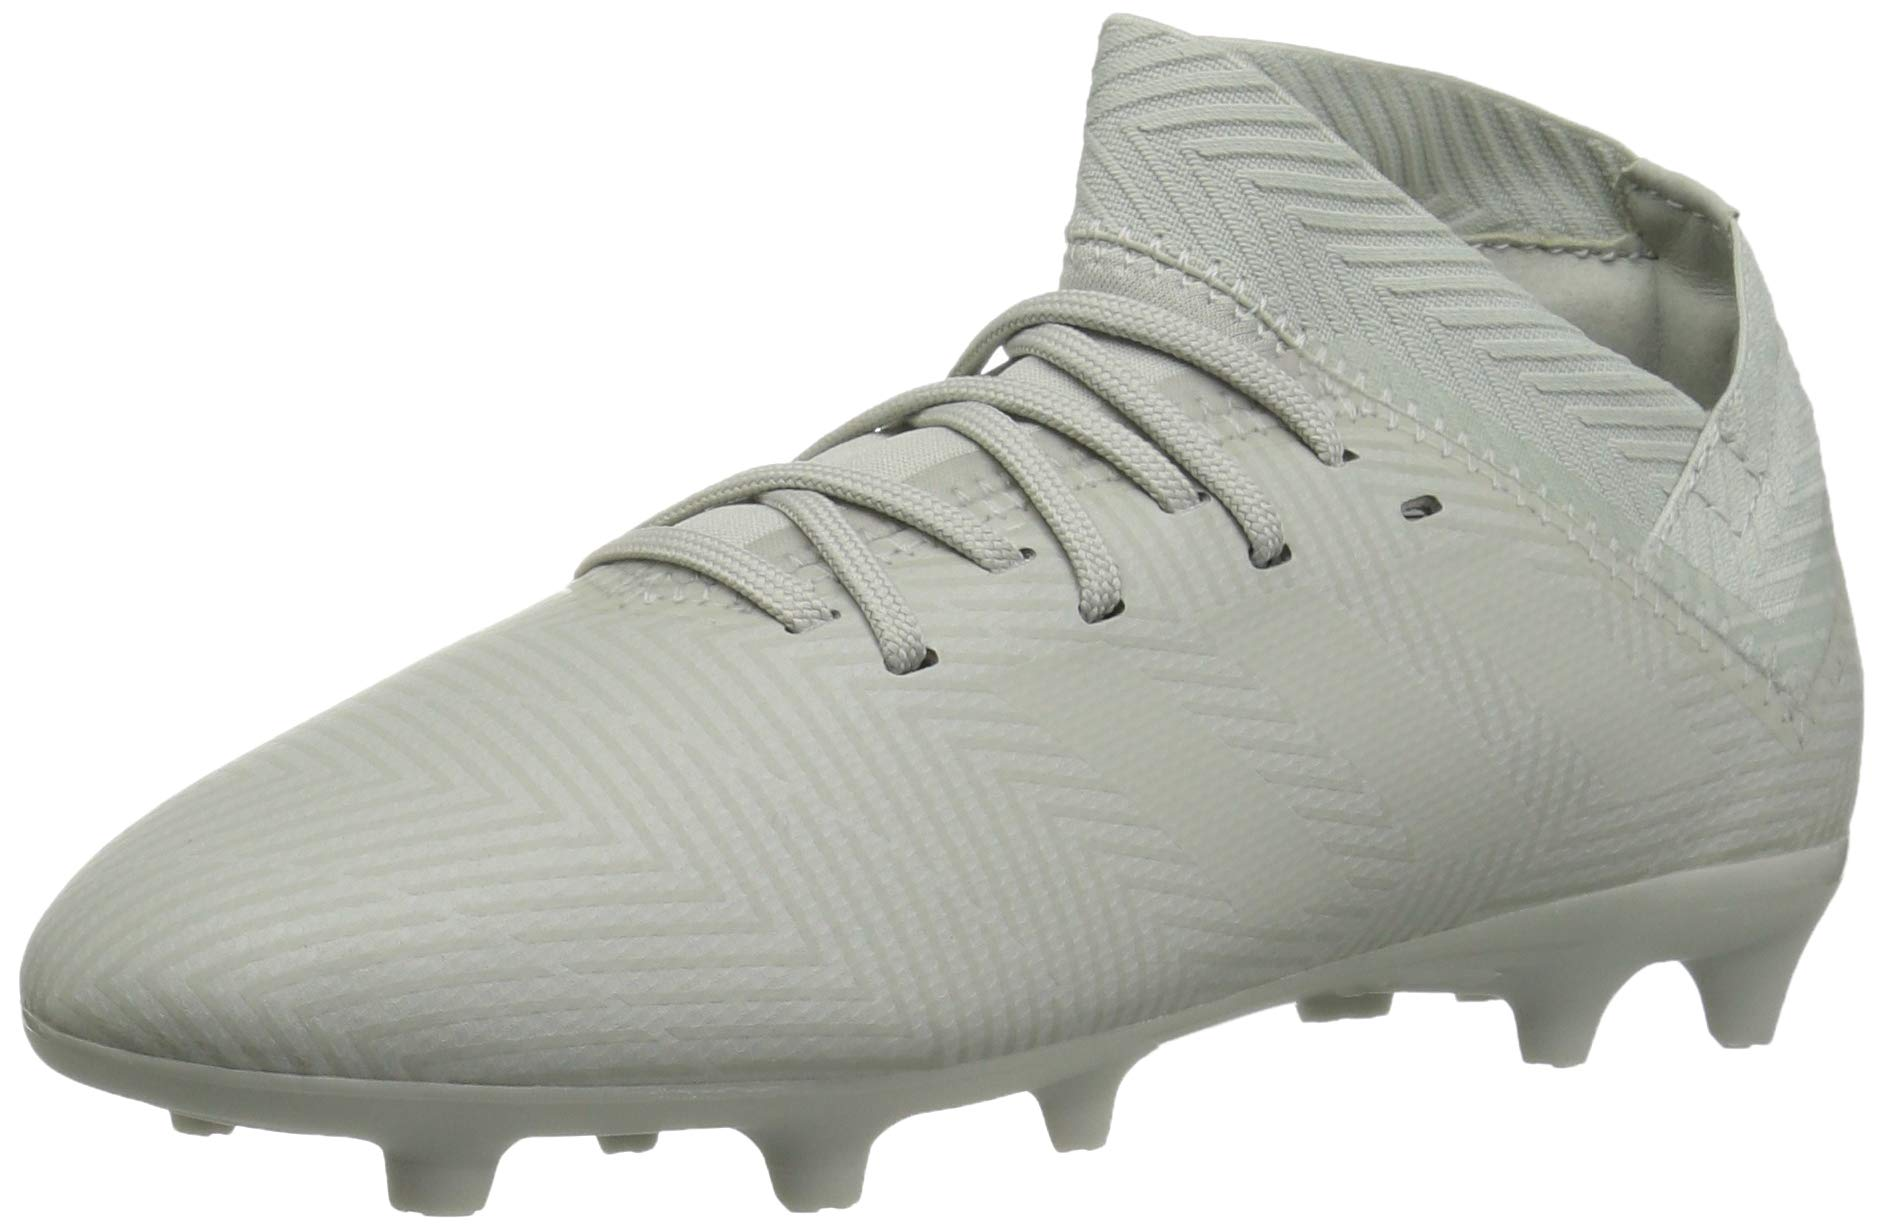 adidas Unisex Nemeziz 18.3 Firm Ground Soccer Shoe, ash Silver/White Tint, 1 M US Little Kid